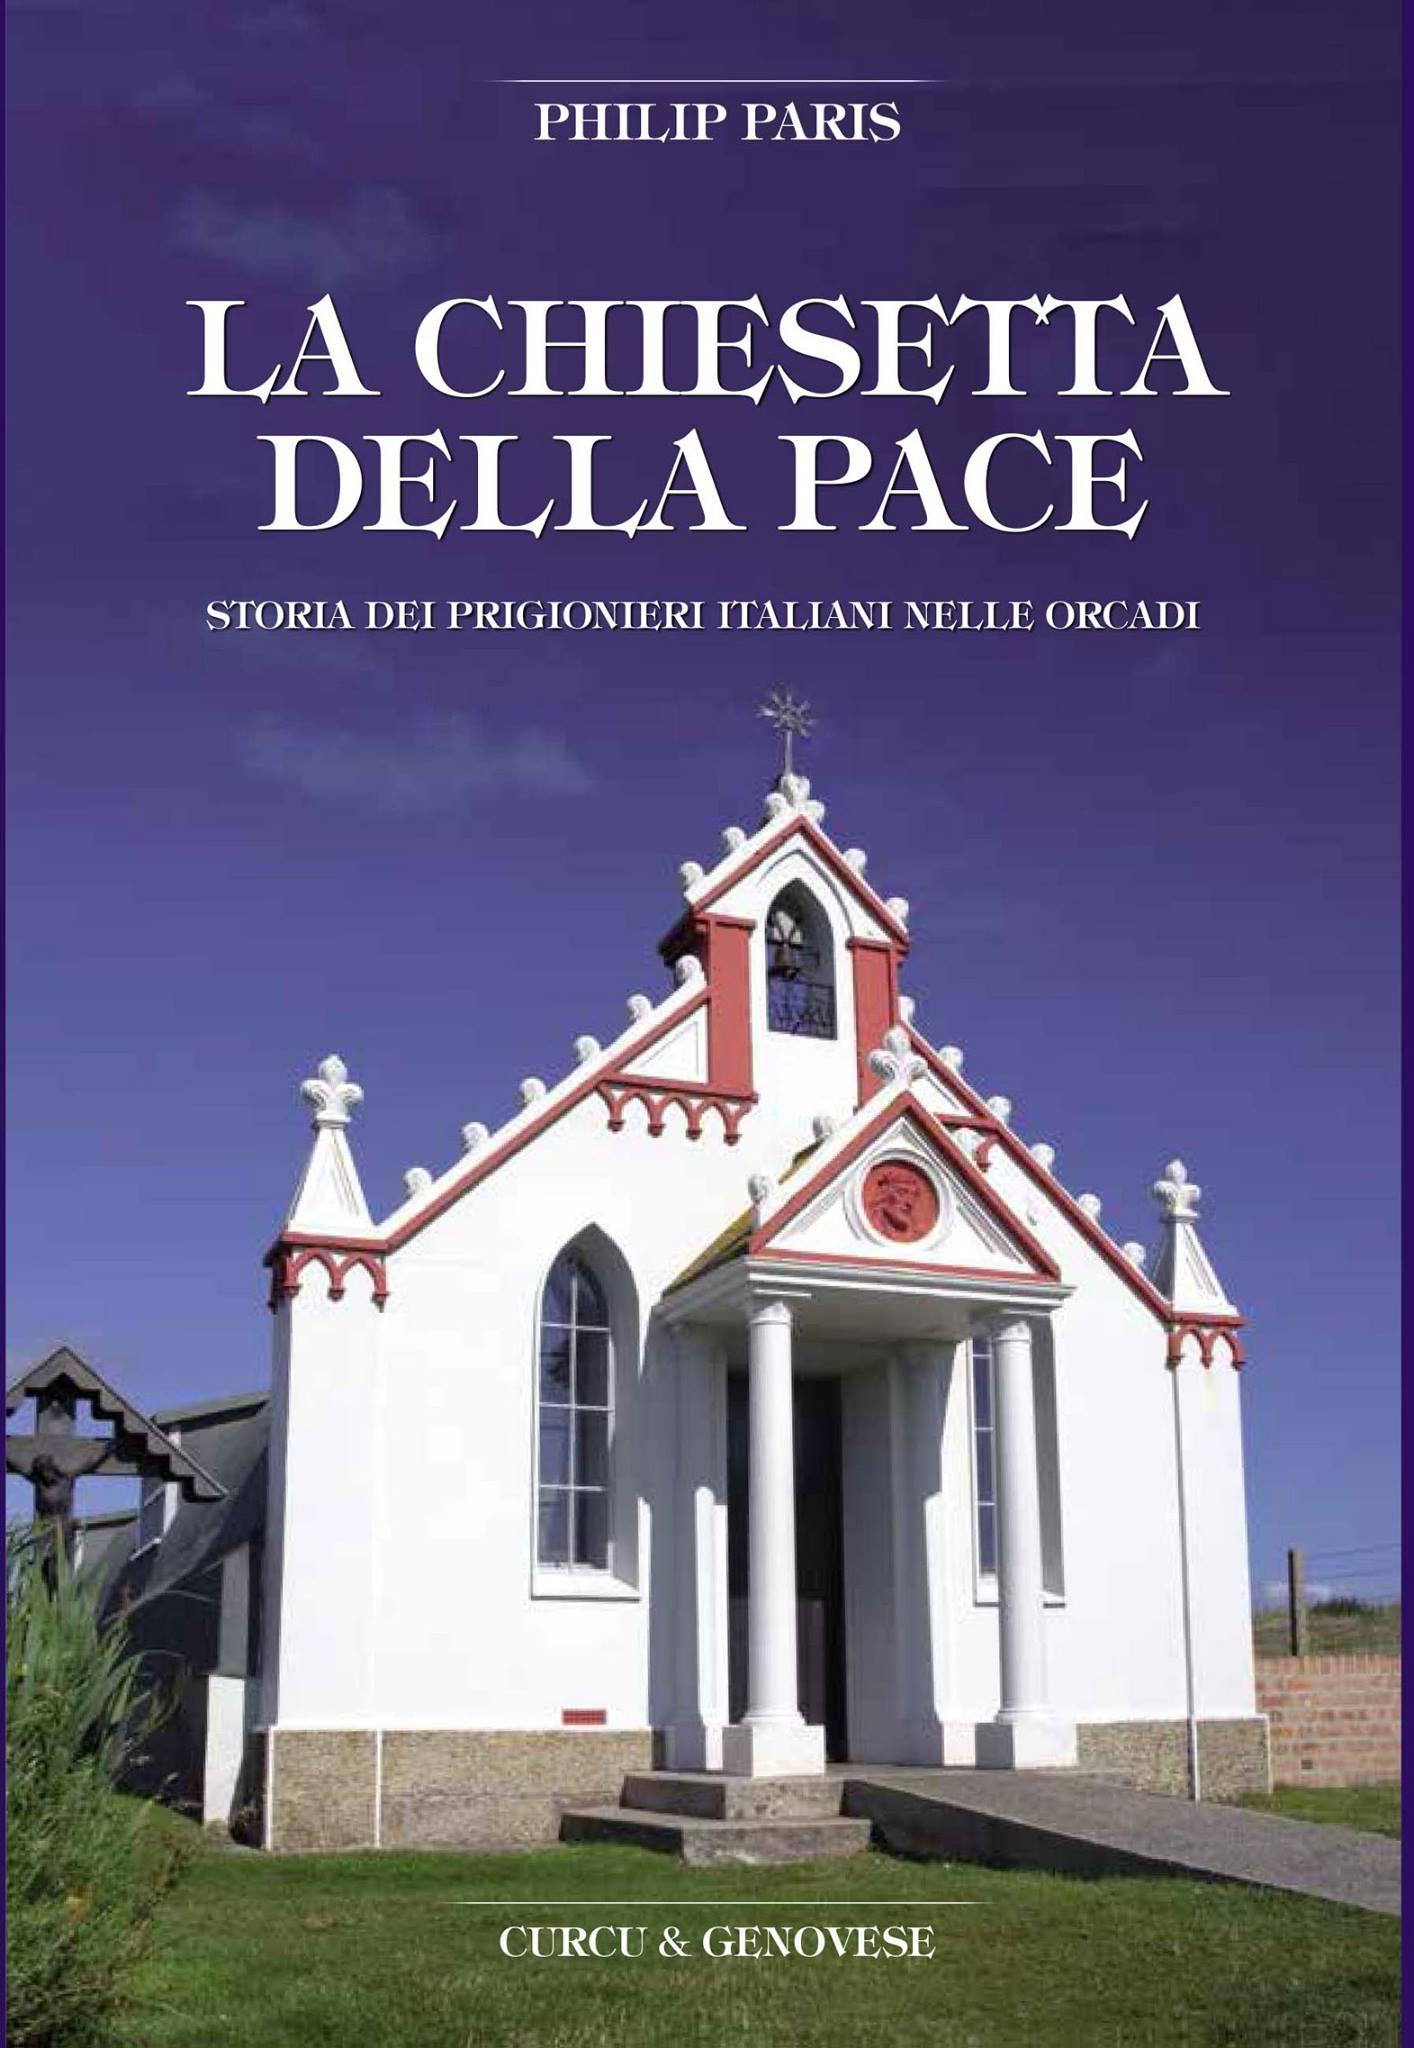 La Chiesetta Della Pace - The Italian Chapel by Philip Paris translated by Inga Sempel